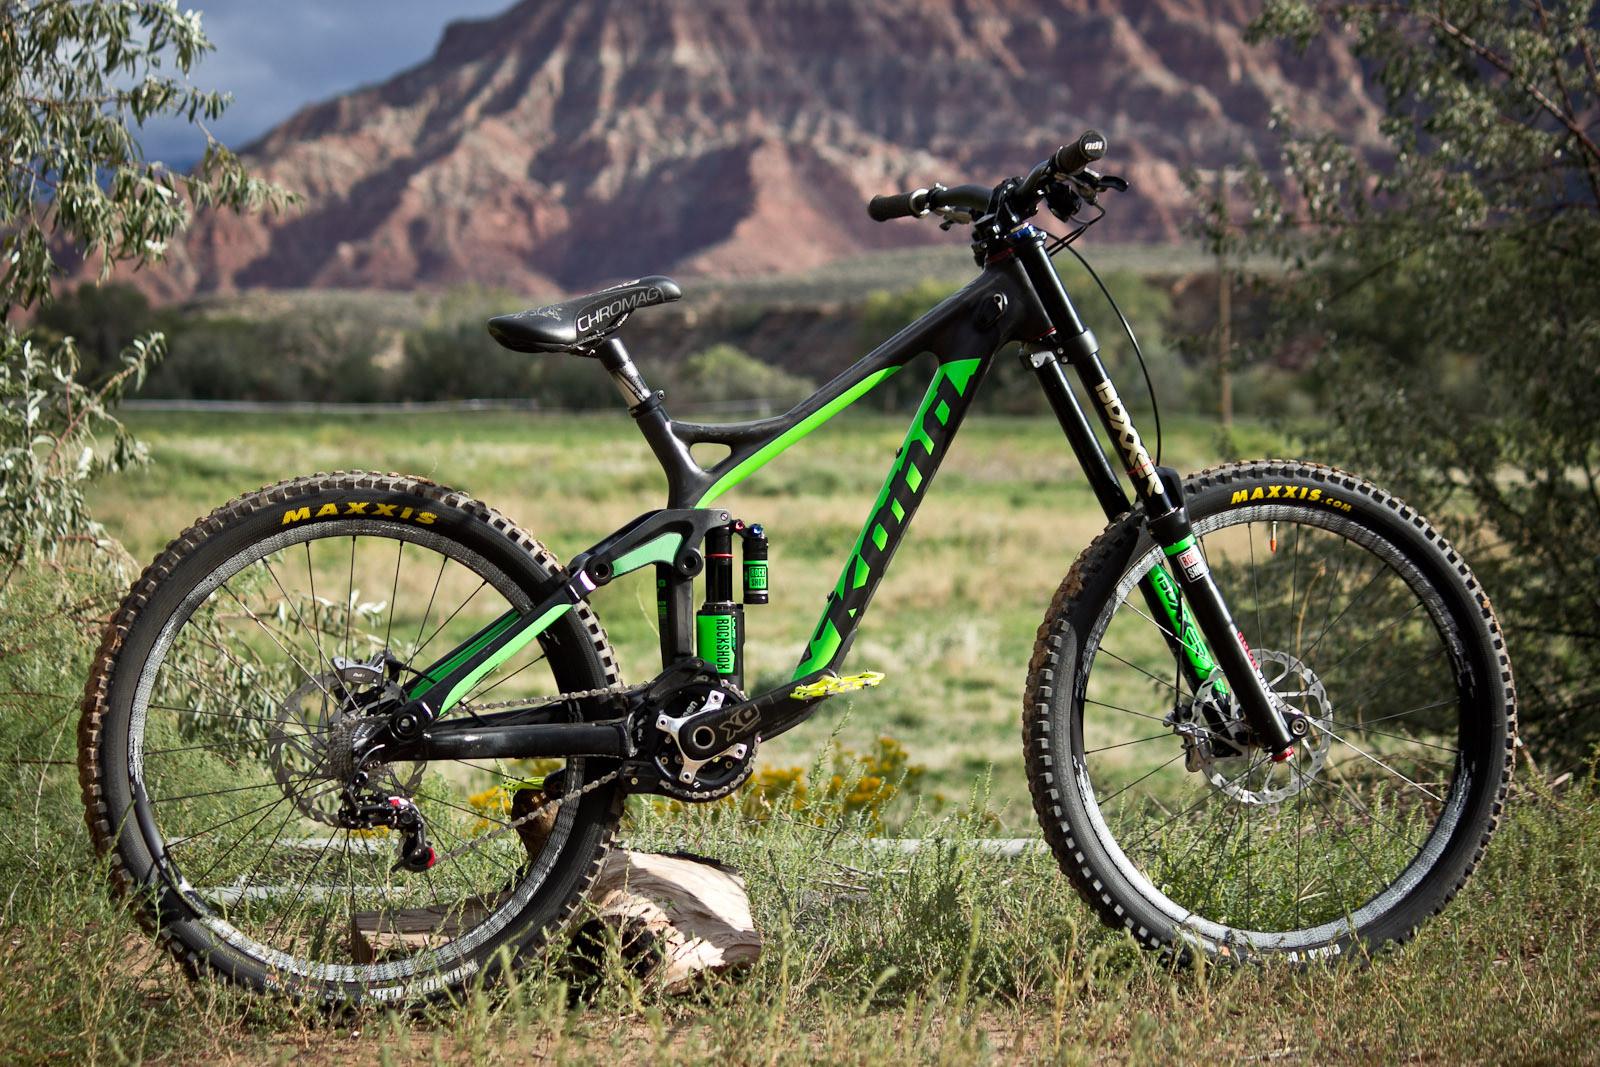 Rampage Pro Bike: Antoine Bizet's Kona Operator Carbon - Rampage Pro Bike: Antoine Bizet's Kona Operator Carbon - Mountain Biking Pictures - Vital MTB